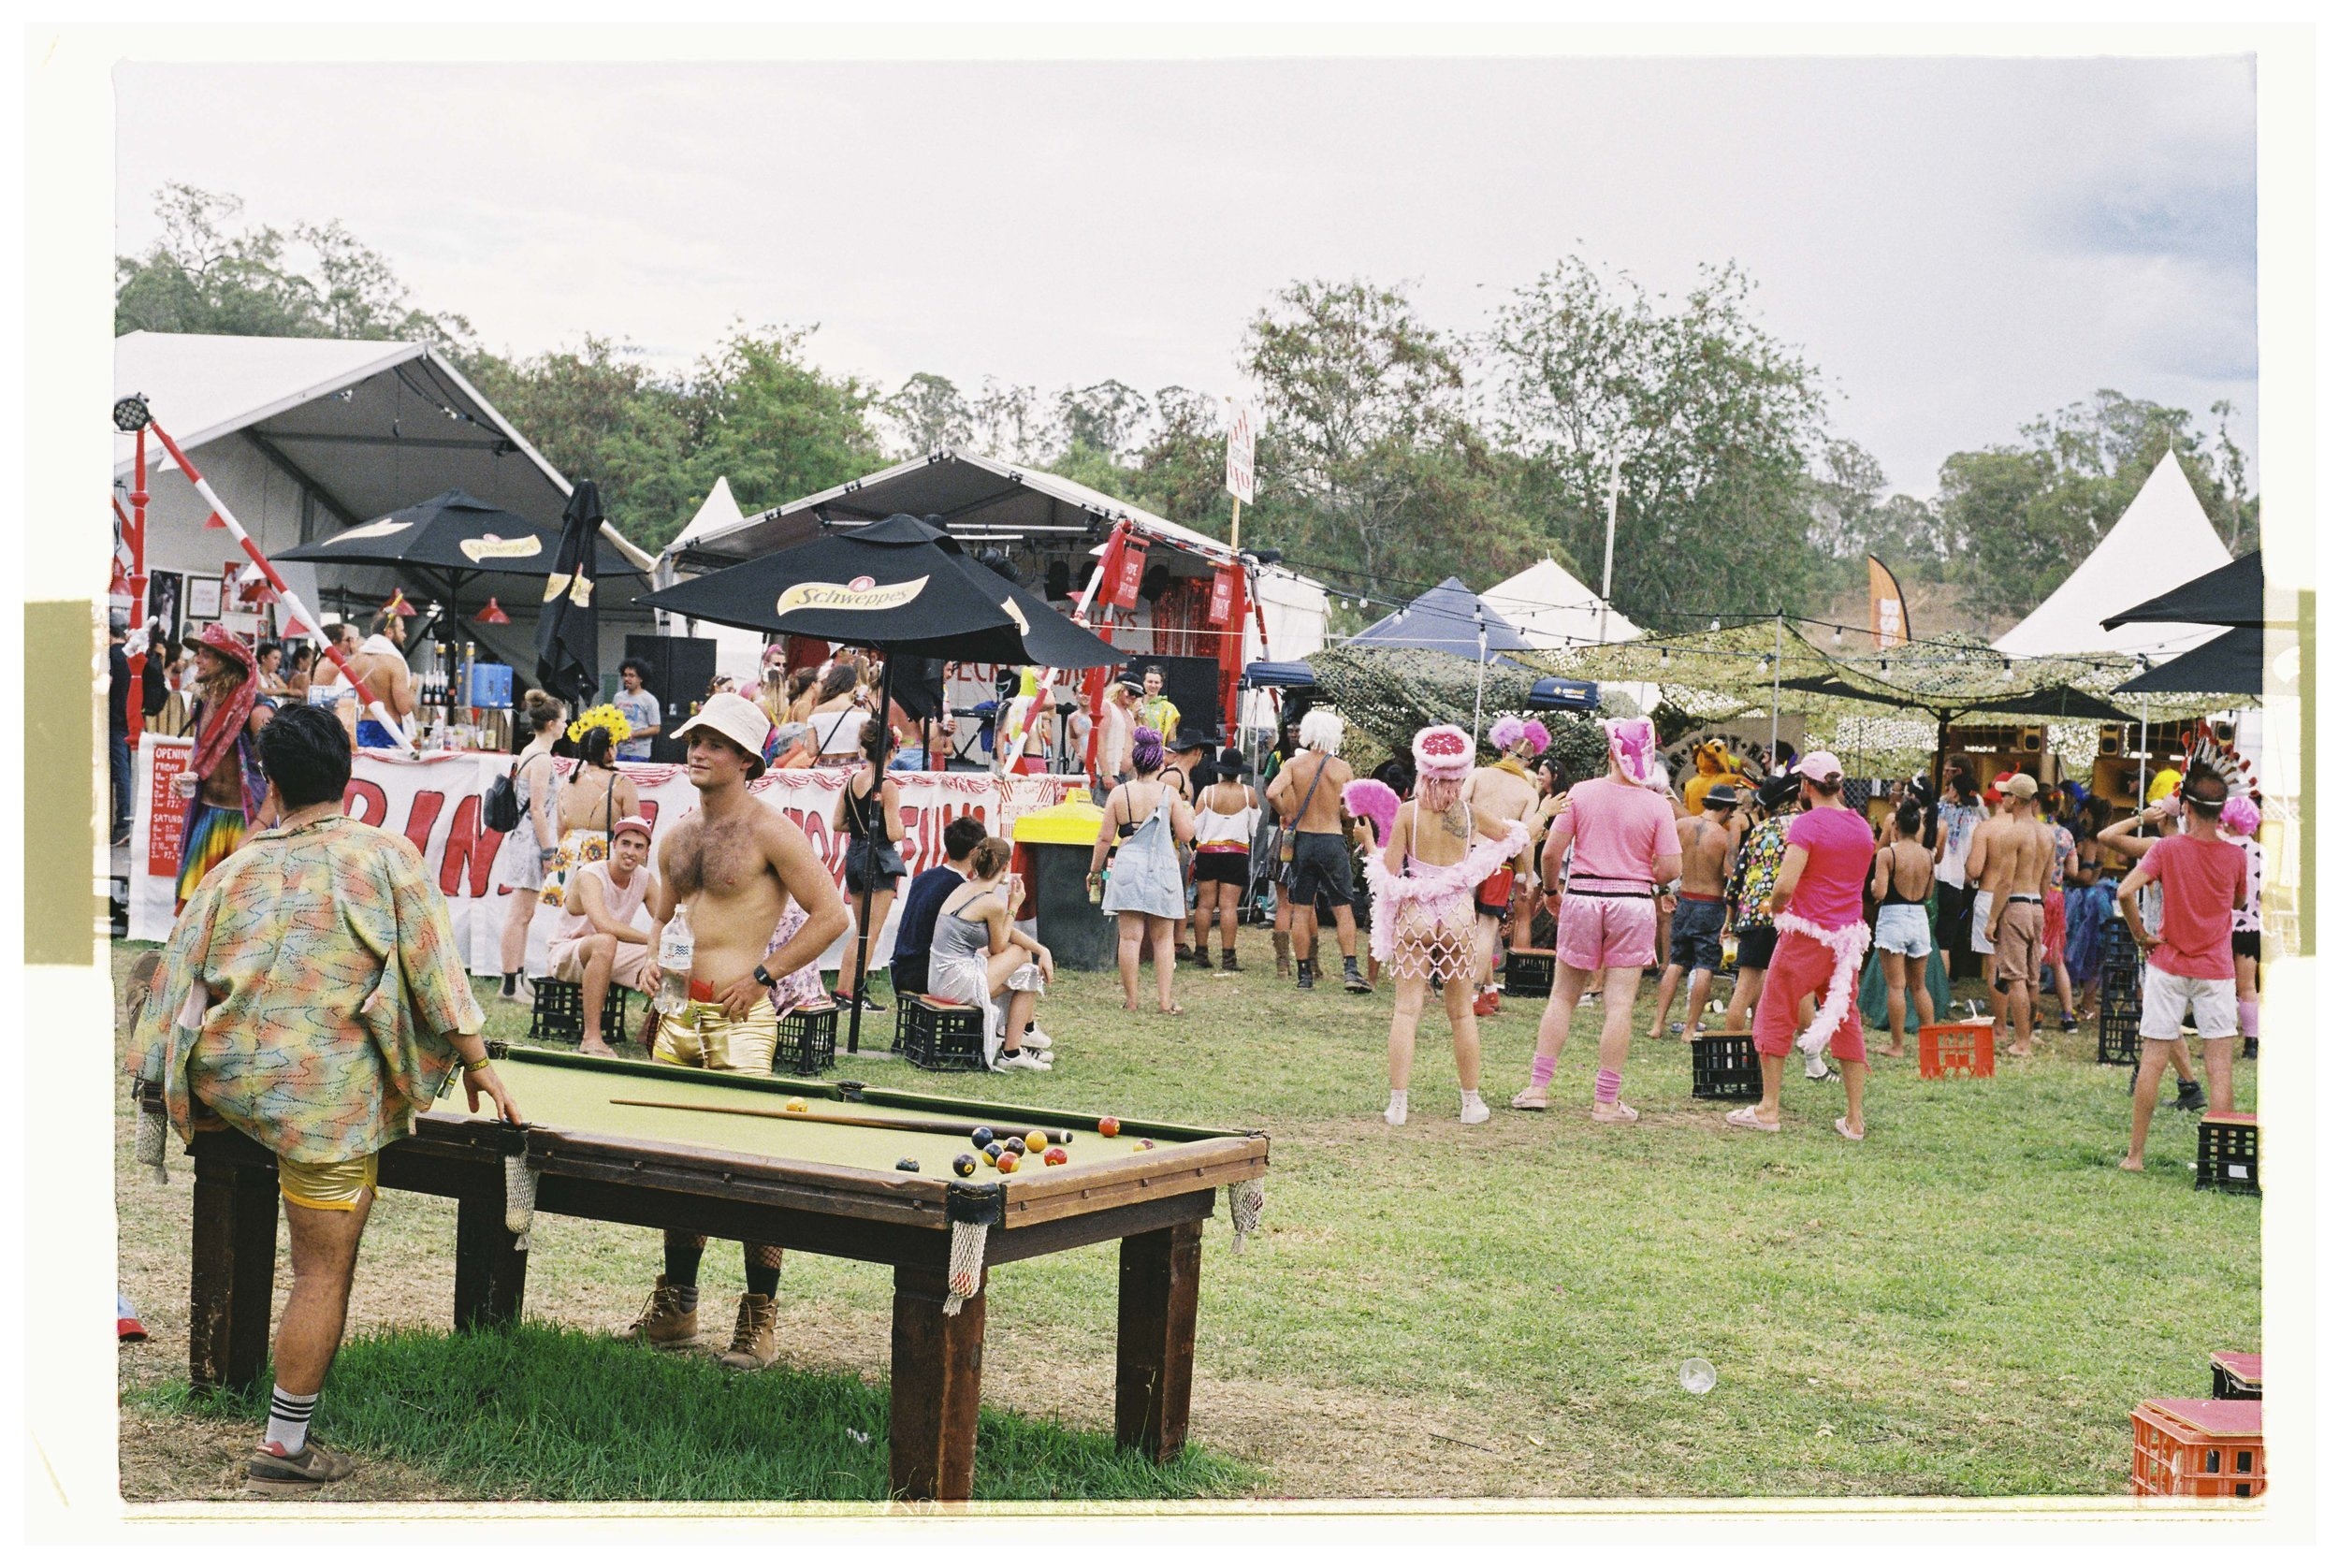 Crowd & Festival - Nikon F3 - Fuji Industrial 100 - 5.jpg